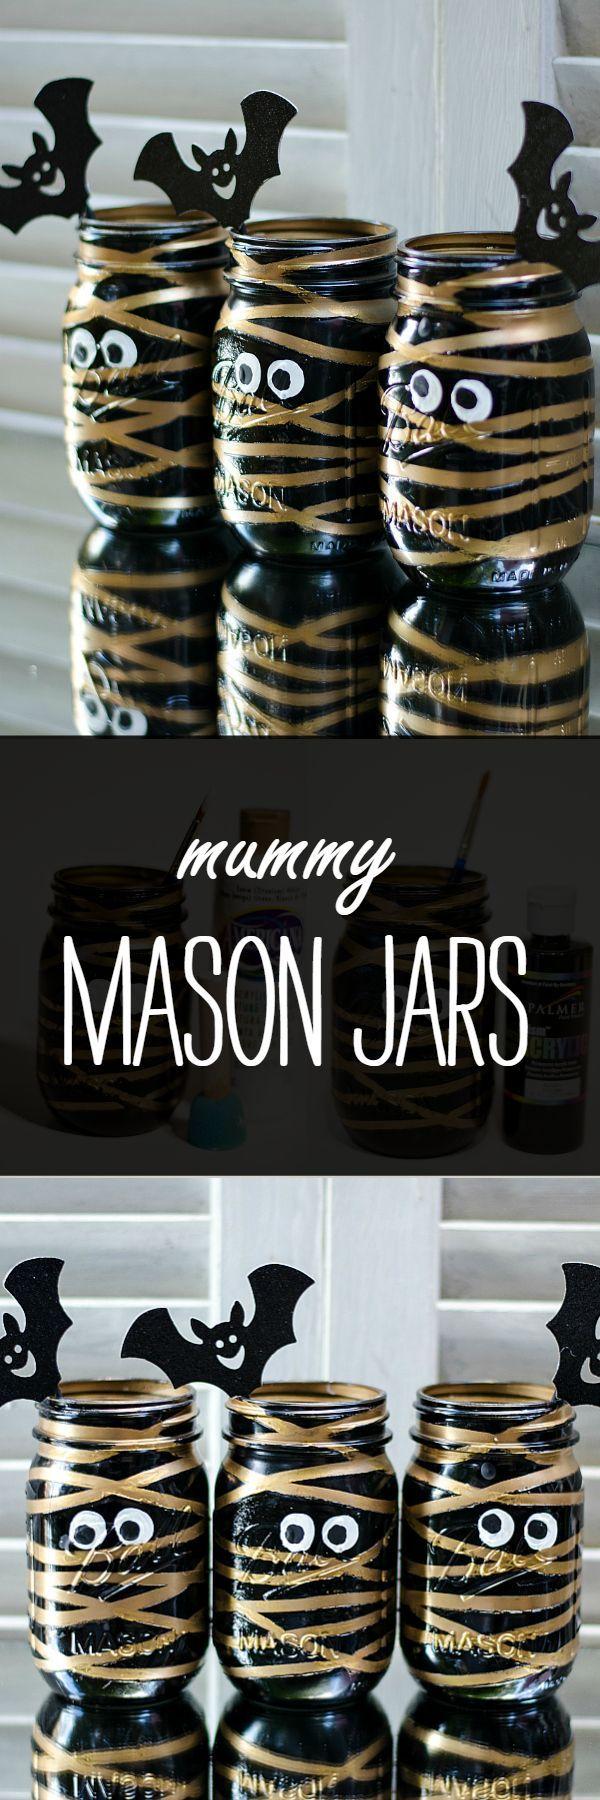 Halloween Craft Idea with Mason Jars: Mummy Mason Jar /iaswp/ (Bottle Decoration Children)